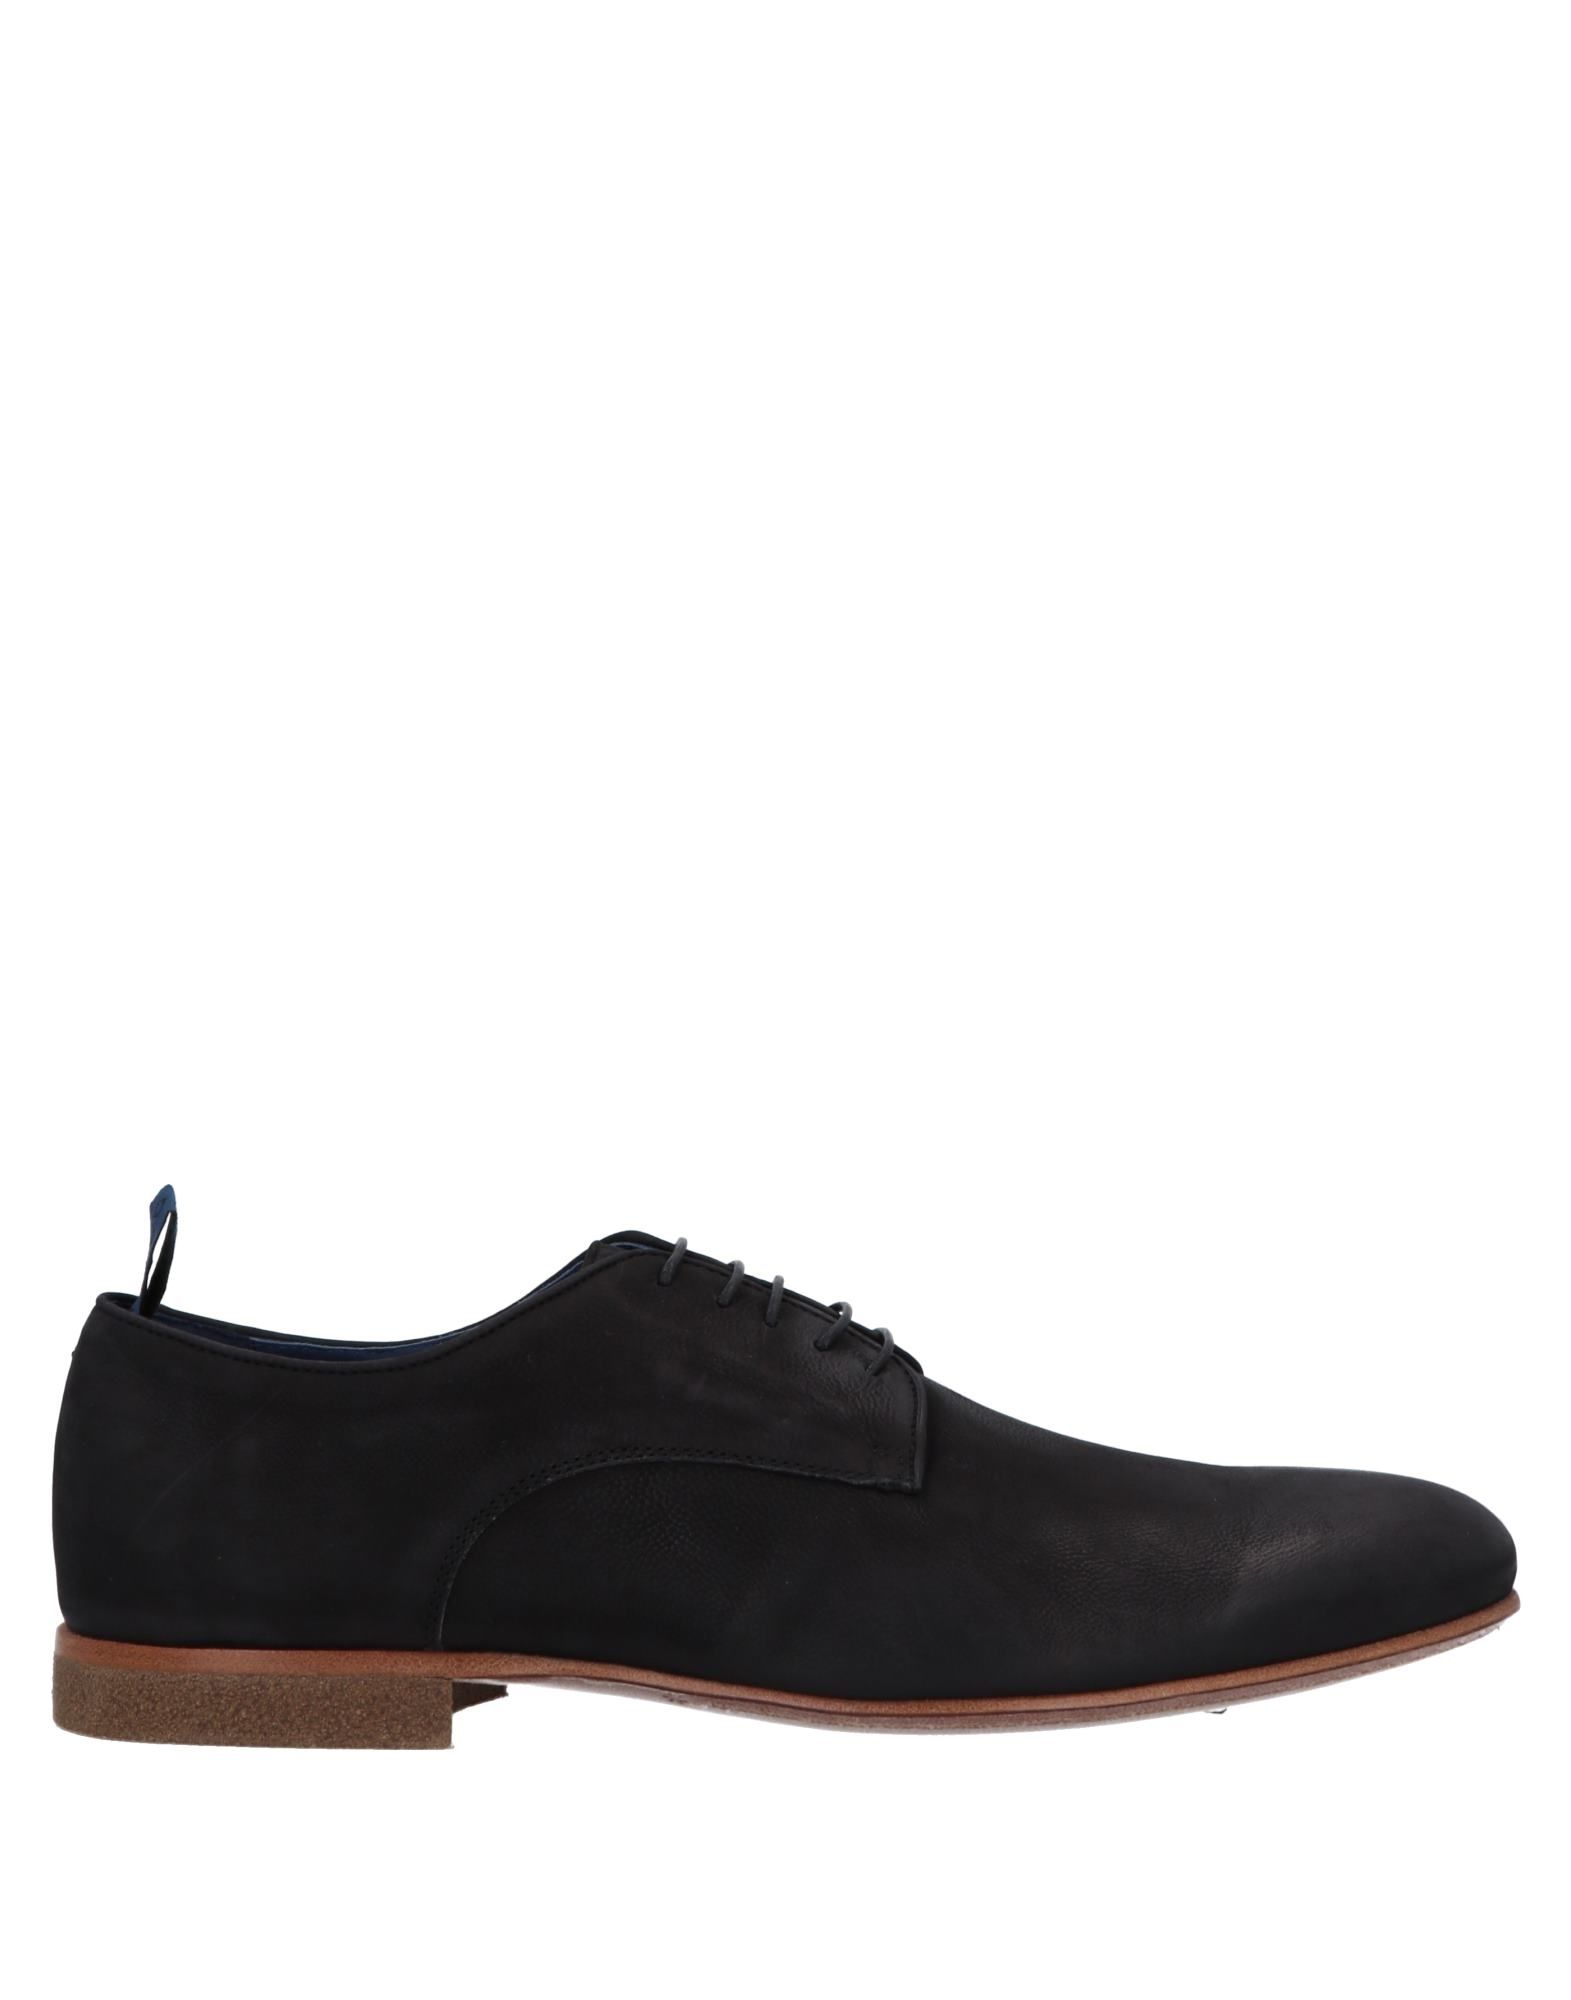 Фото - ALBERTO GUARDIANI Обувь на шнурках обувь на высокой платформе dkny